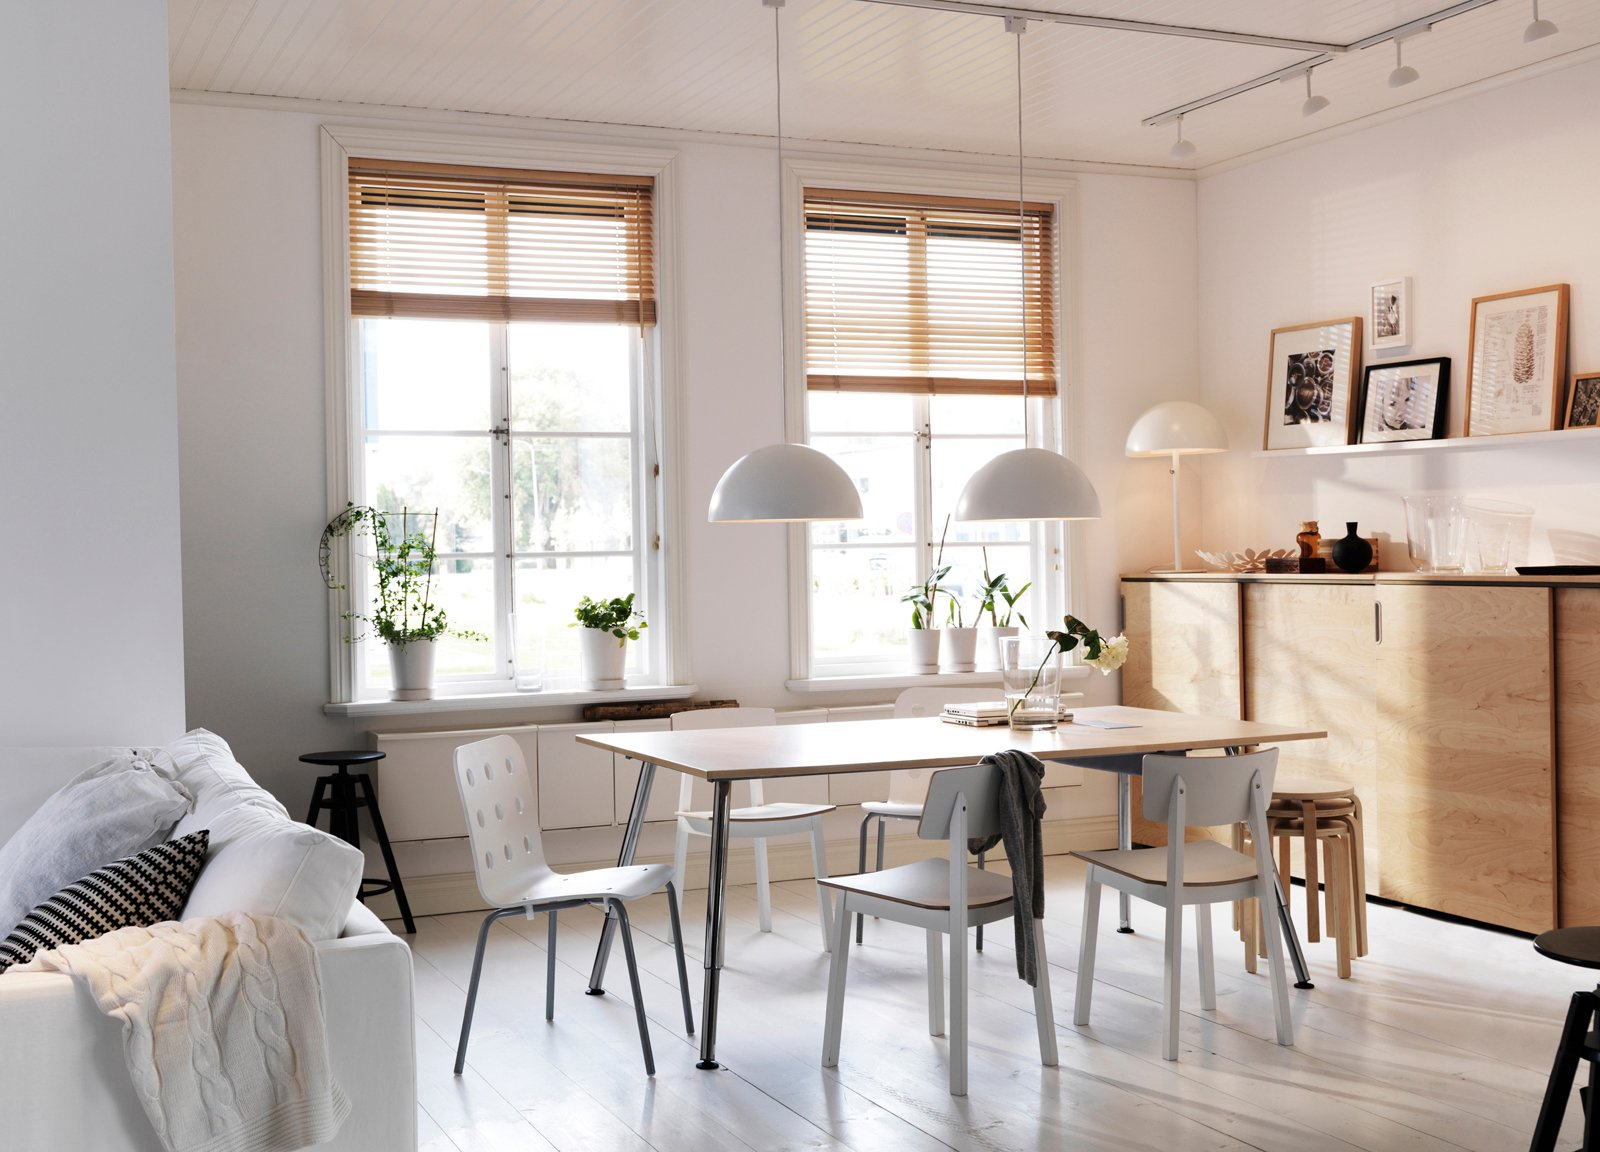 Le tende a pacchetto cose di casa - Ikea tende da cucina ...